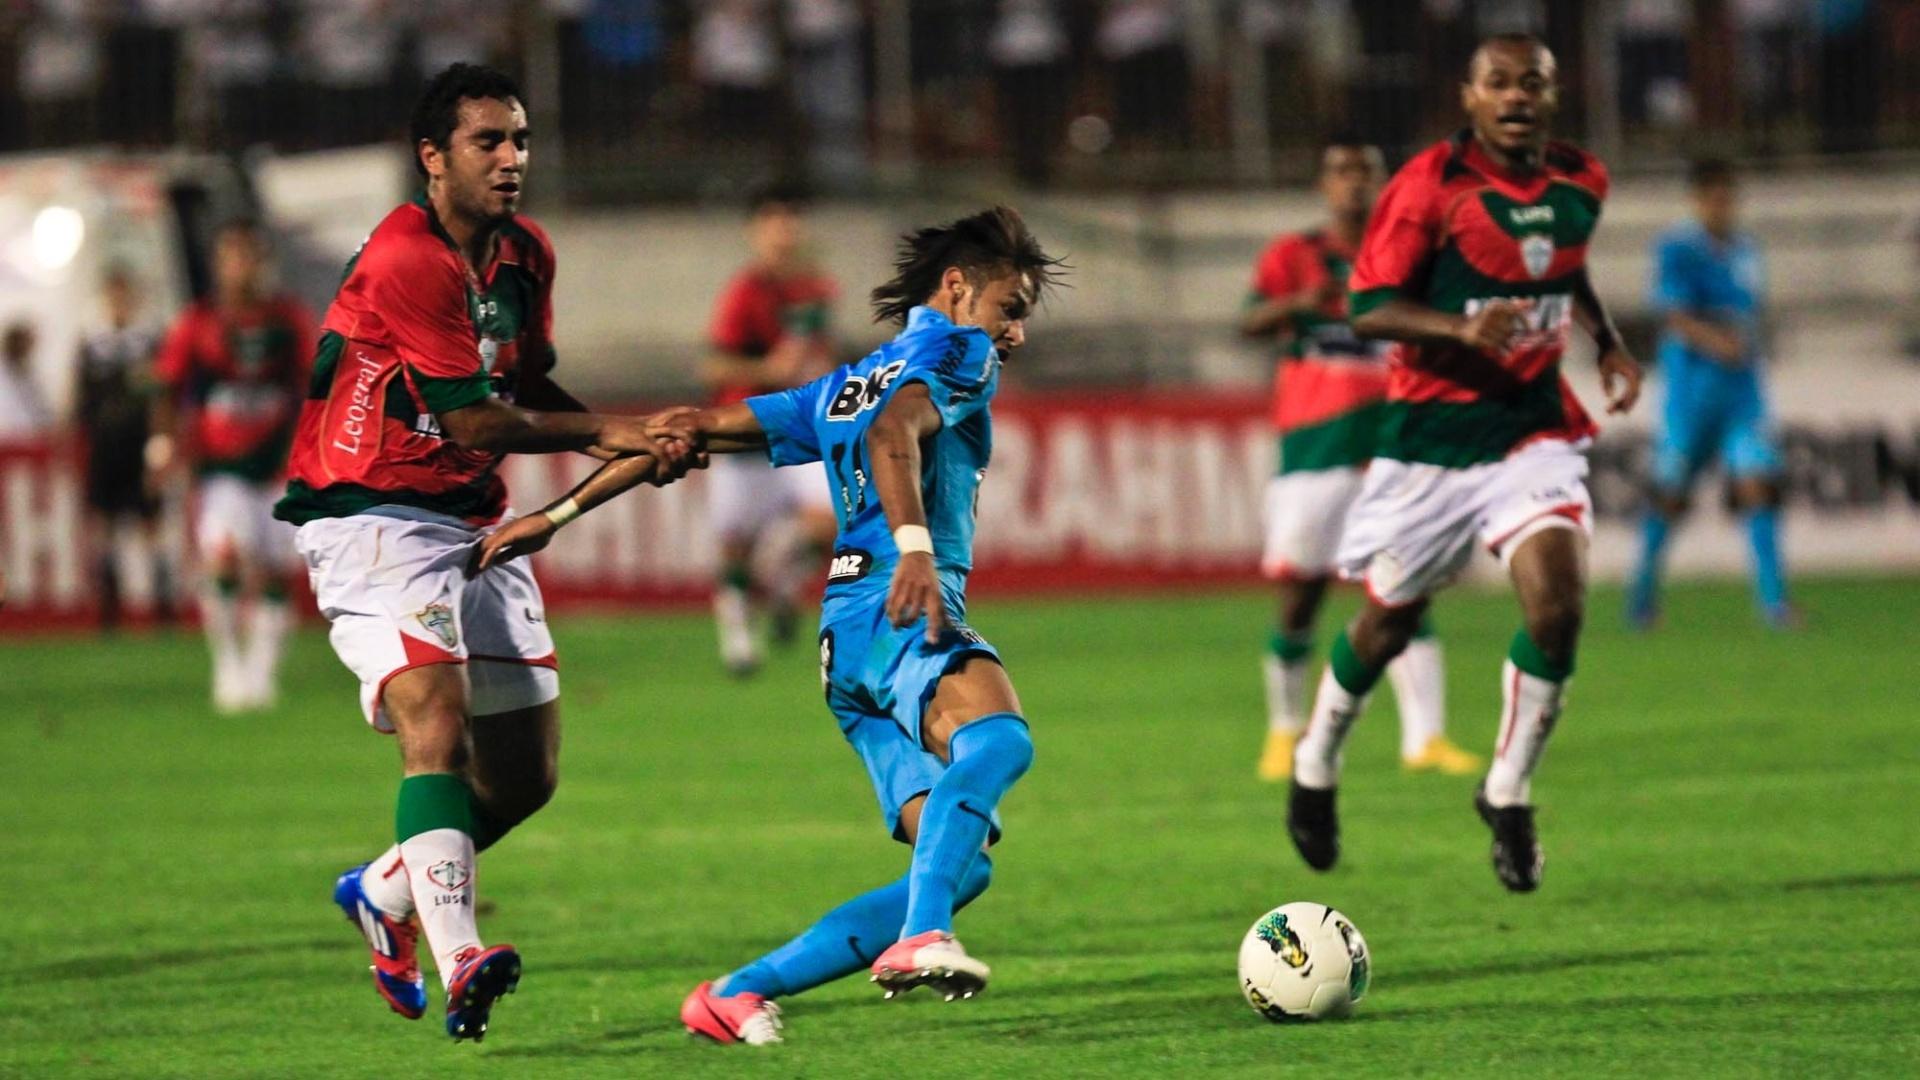 Mesmo sendo puxado, Neymar consegue passar a bola para Borges, no jogo contra a Portuguesa